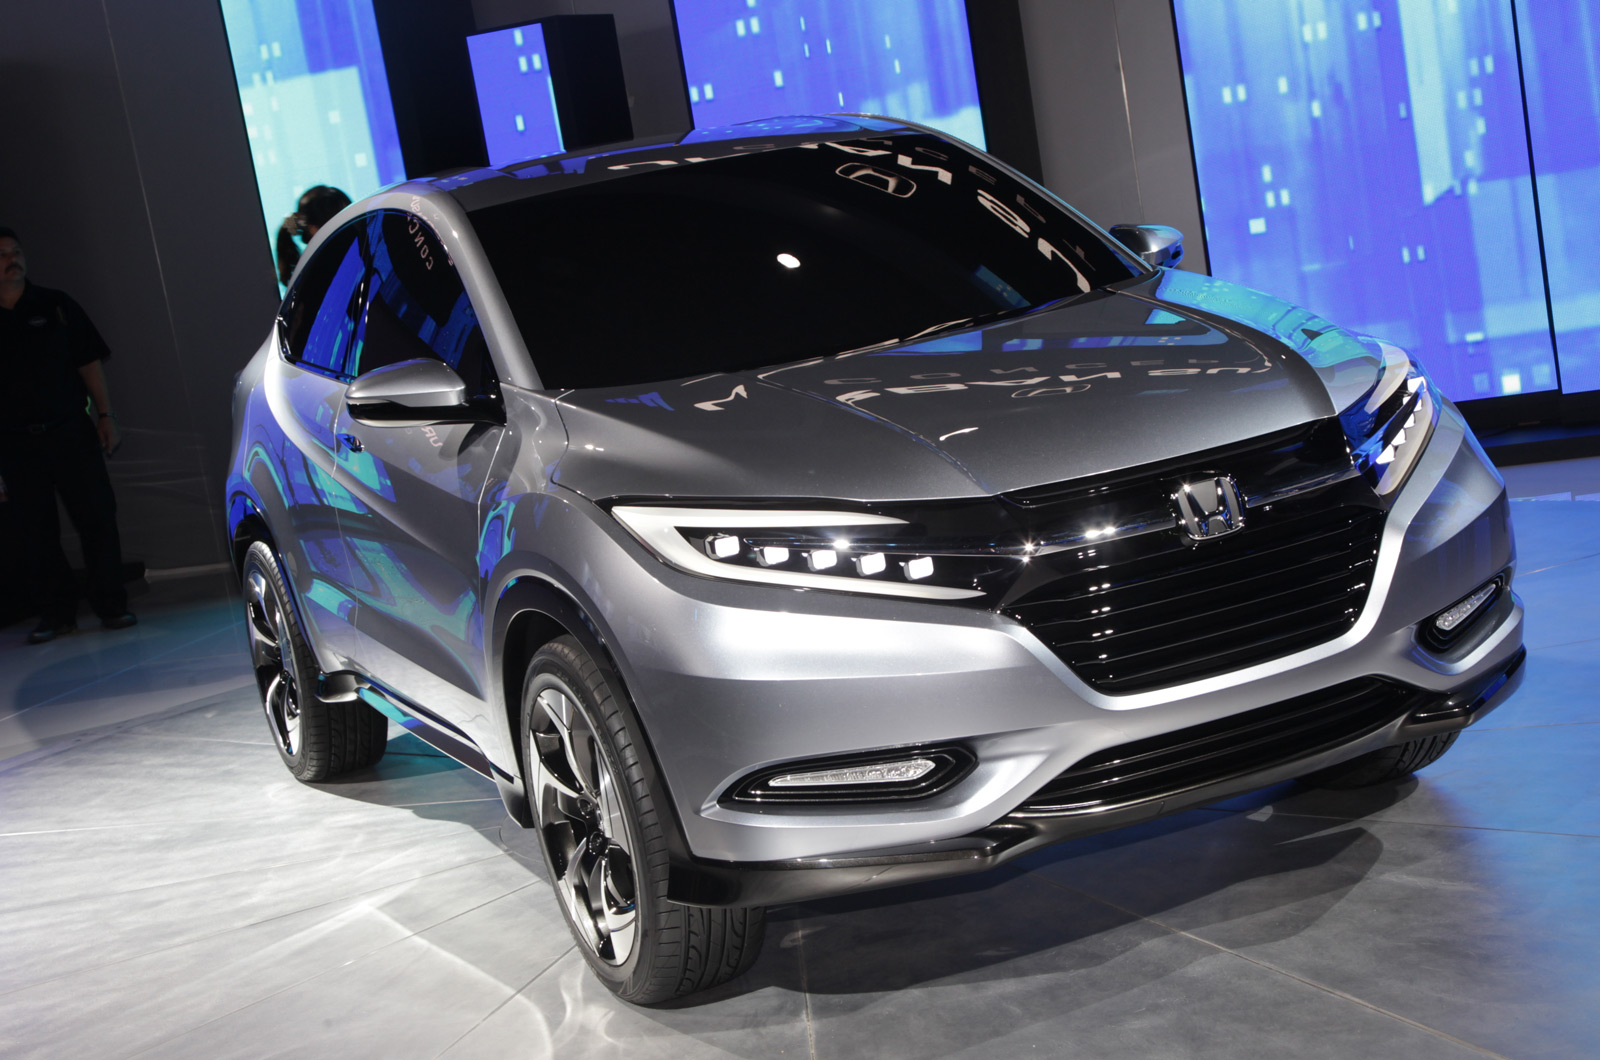 Honda Urban SUV concept revealed - Autocar India